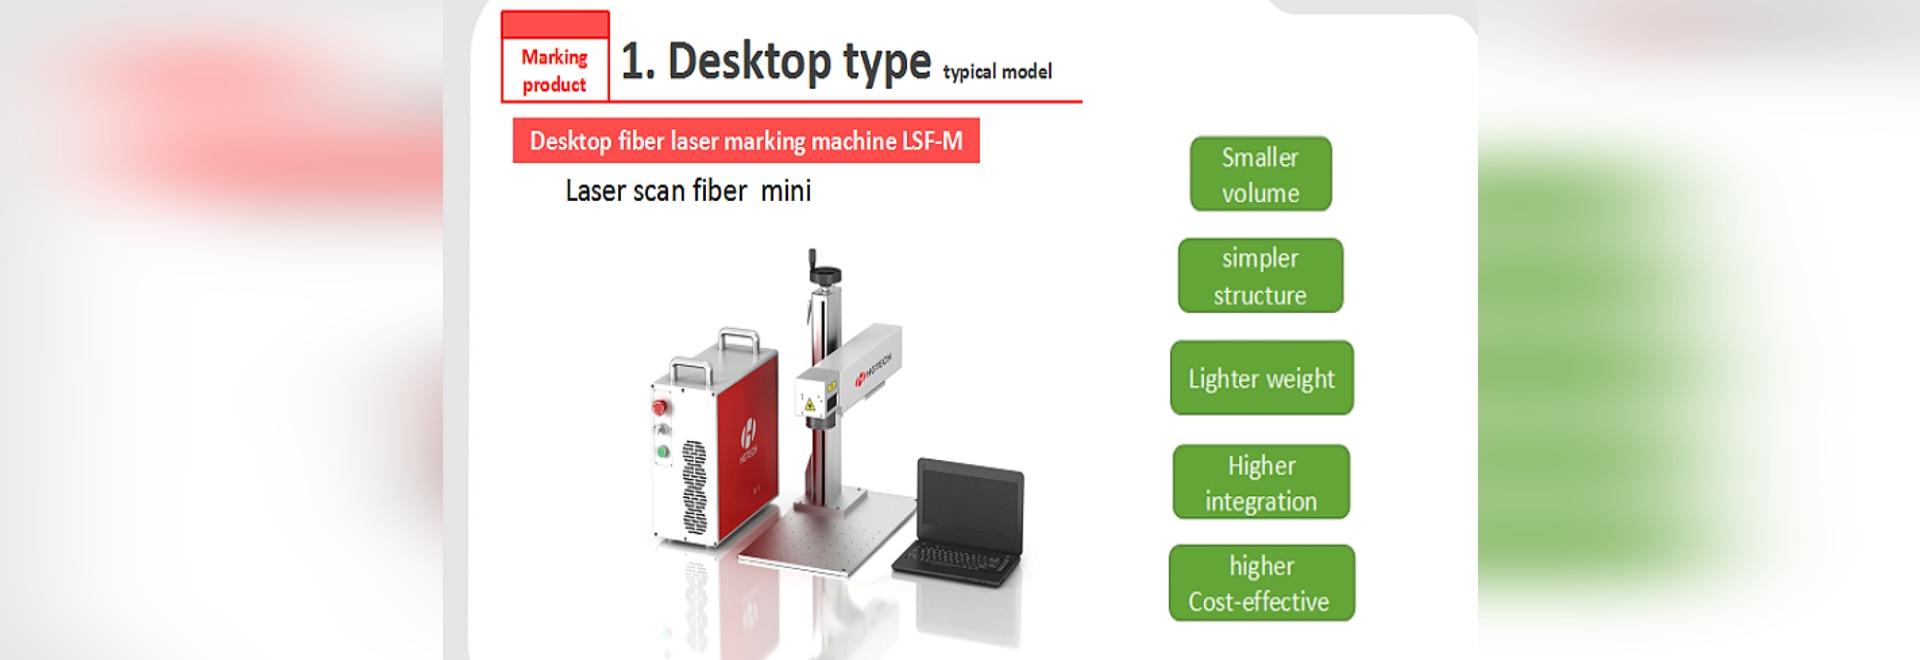 Desktop fiber laser marking machine LSF-M